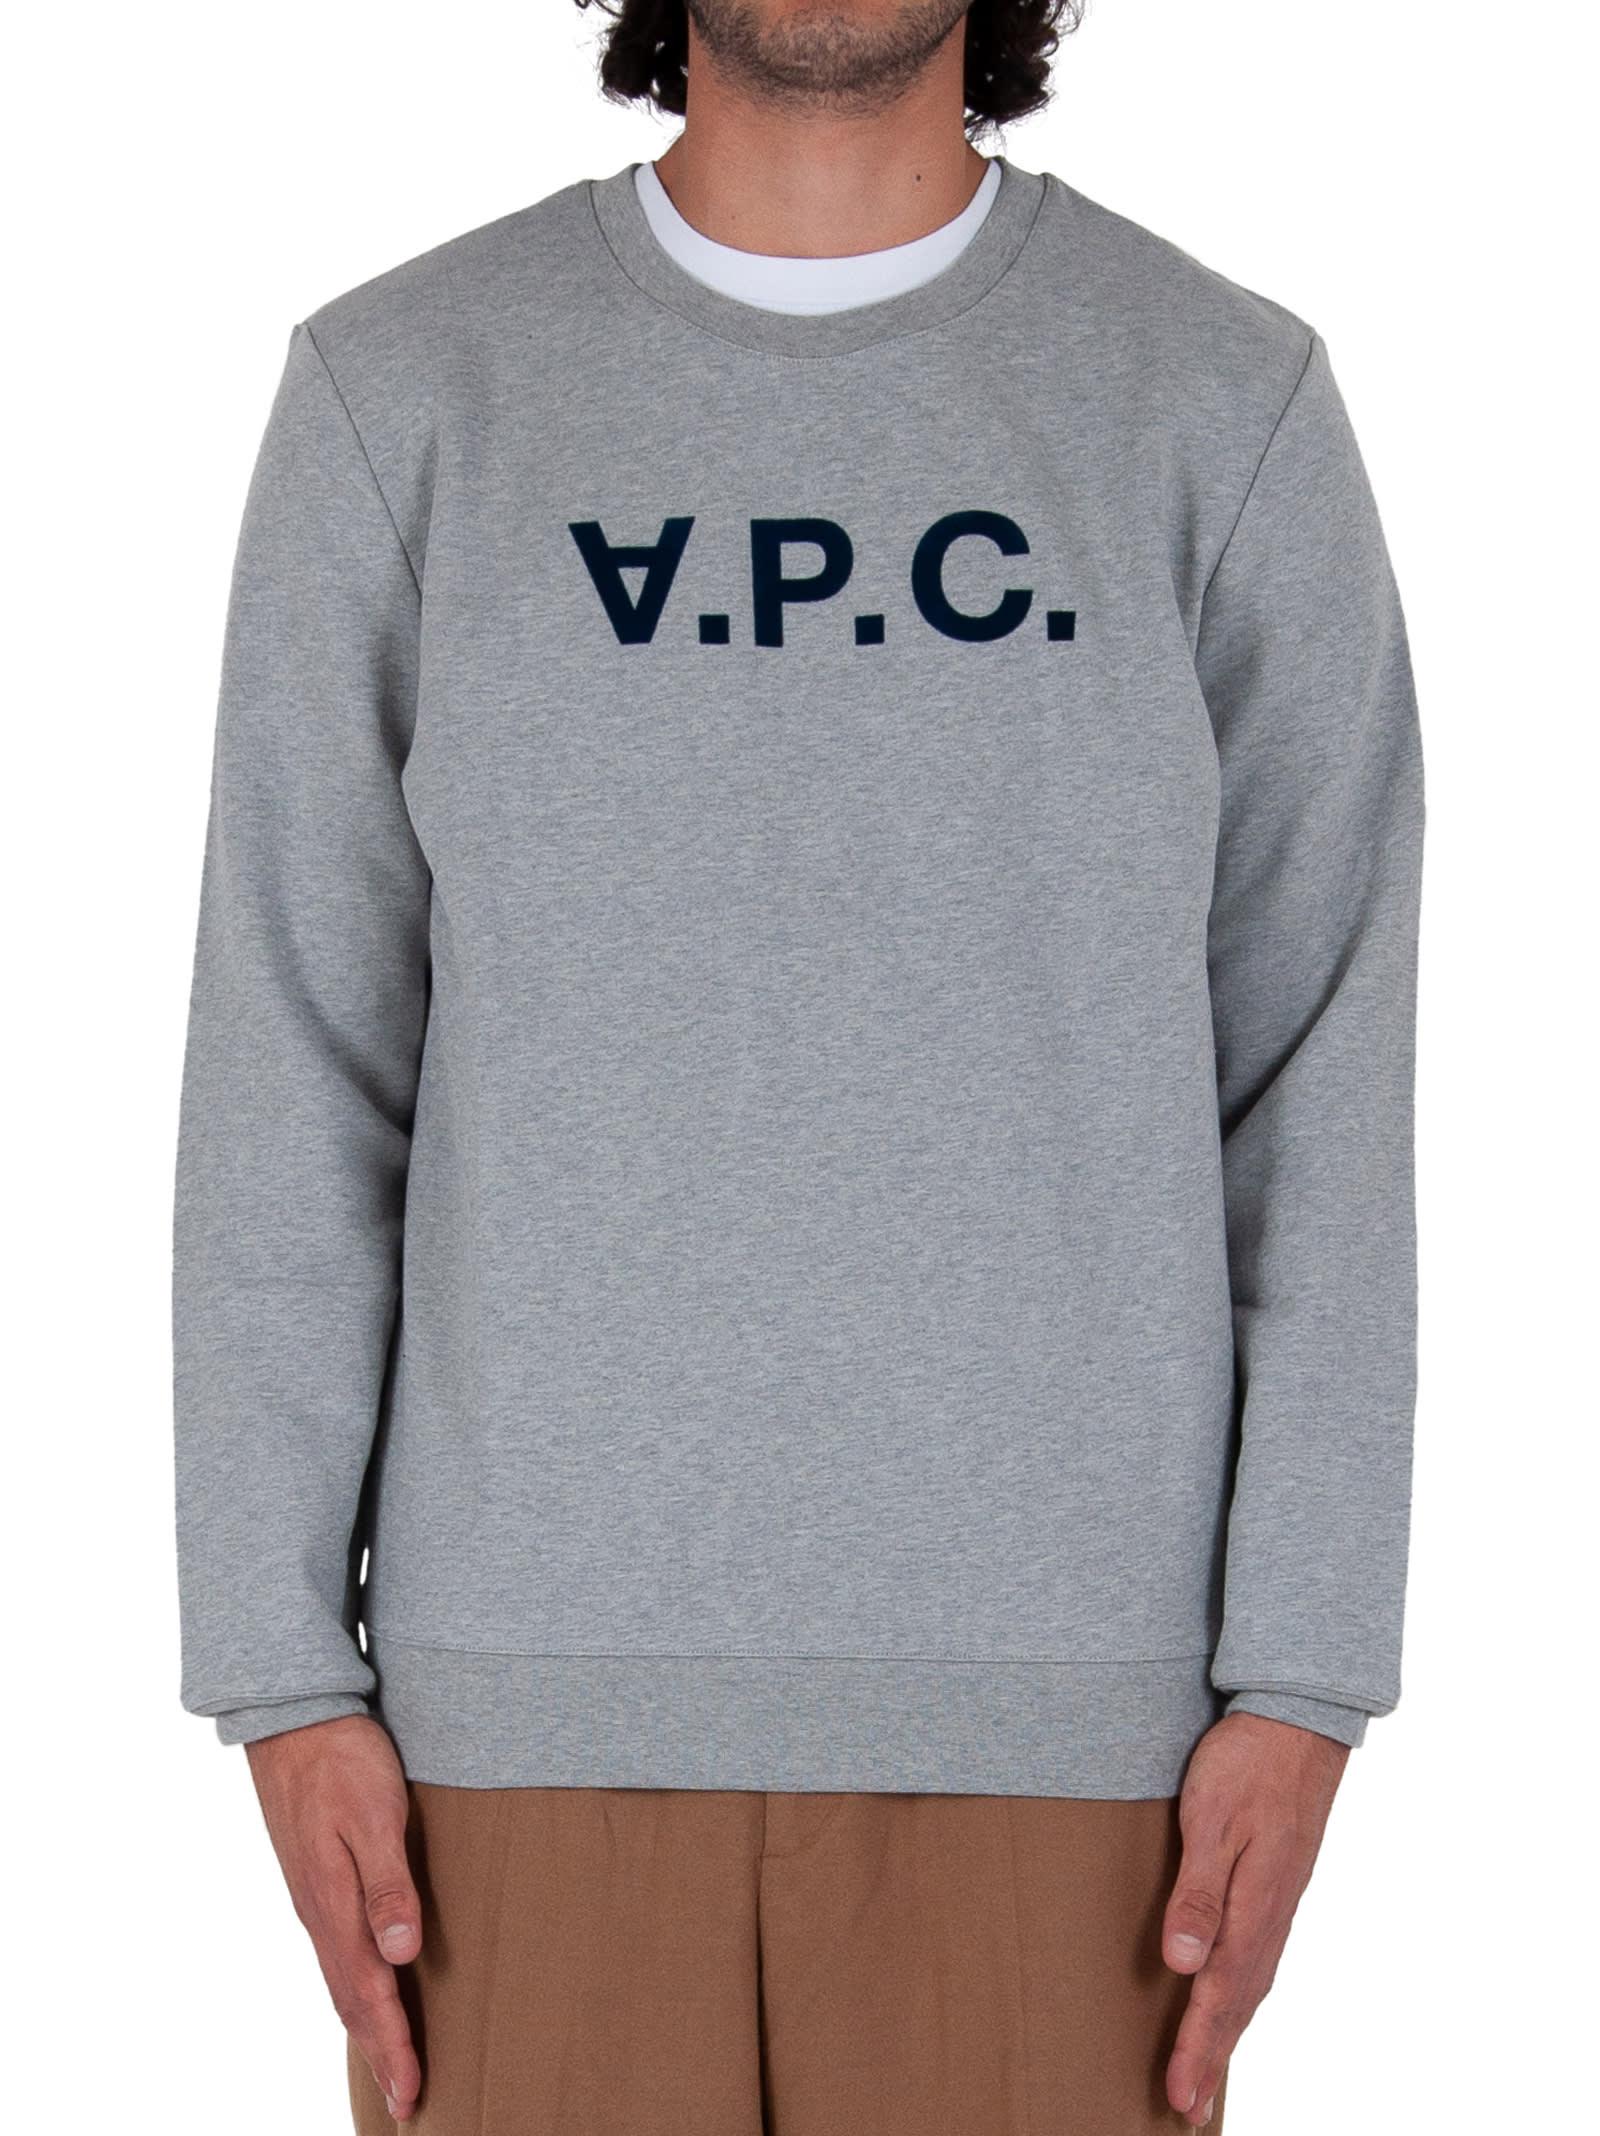 A.p.c. VPC SWEATSHIRT - GREY